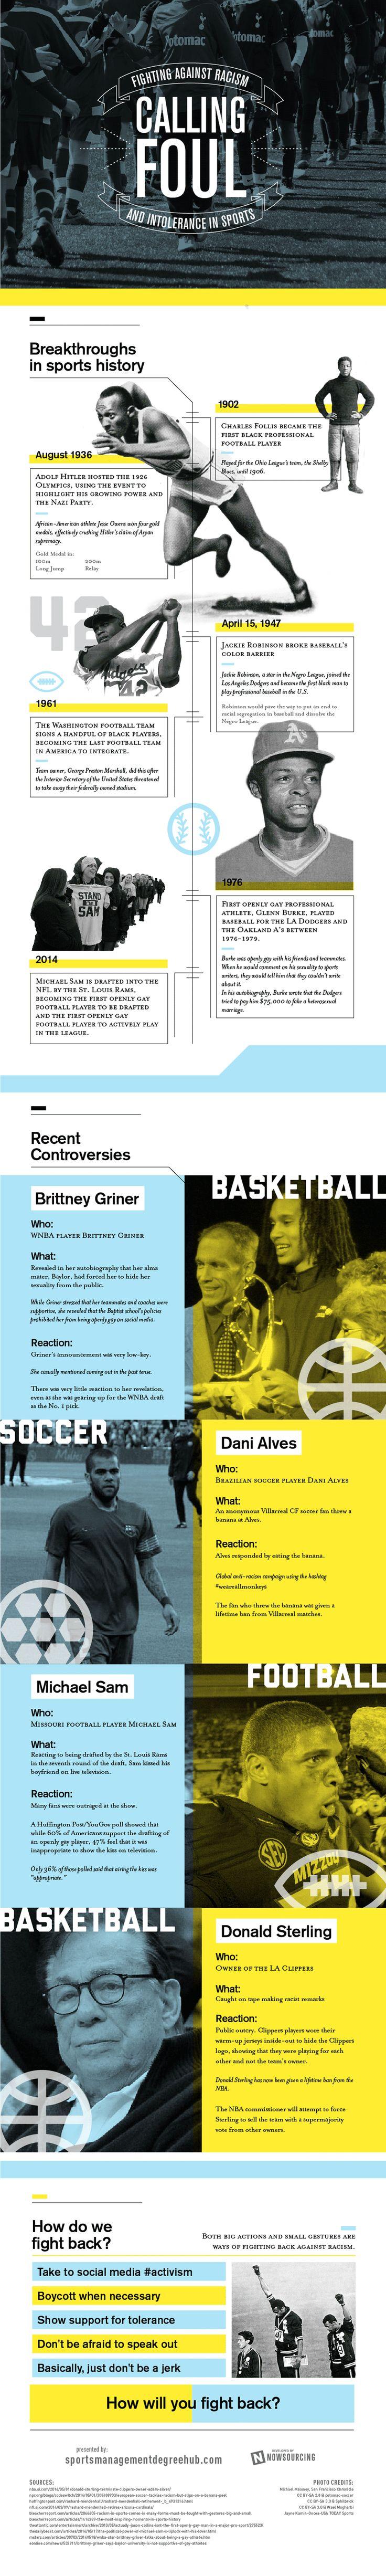 venngage-wordpress.s3.amazonaws.com uploads 2016 06 racism-in-sports.png